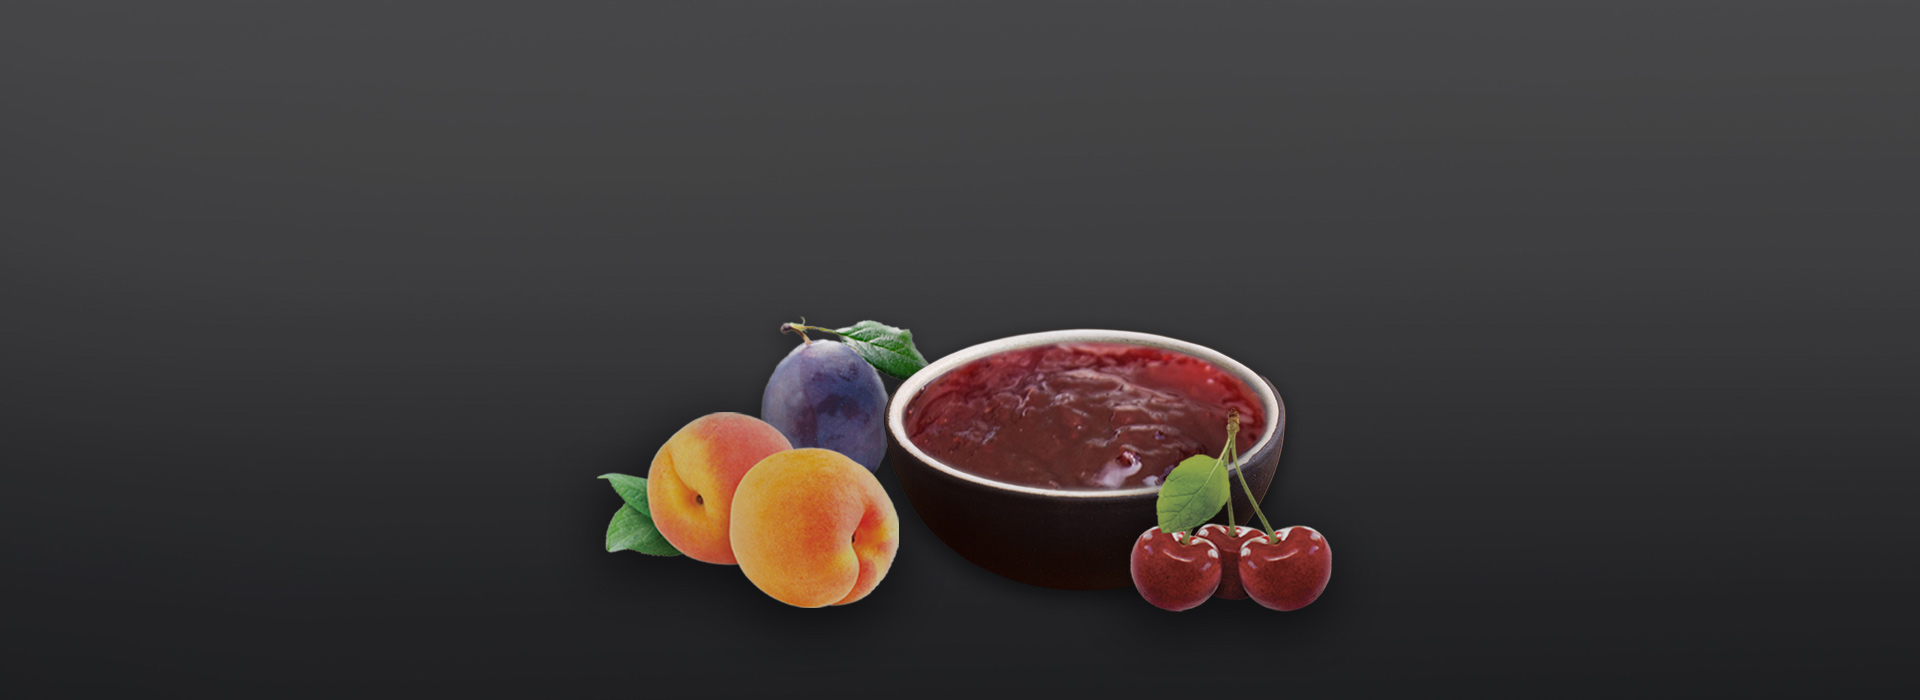 sraml-Apricot-cherry-plum-puree